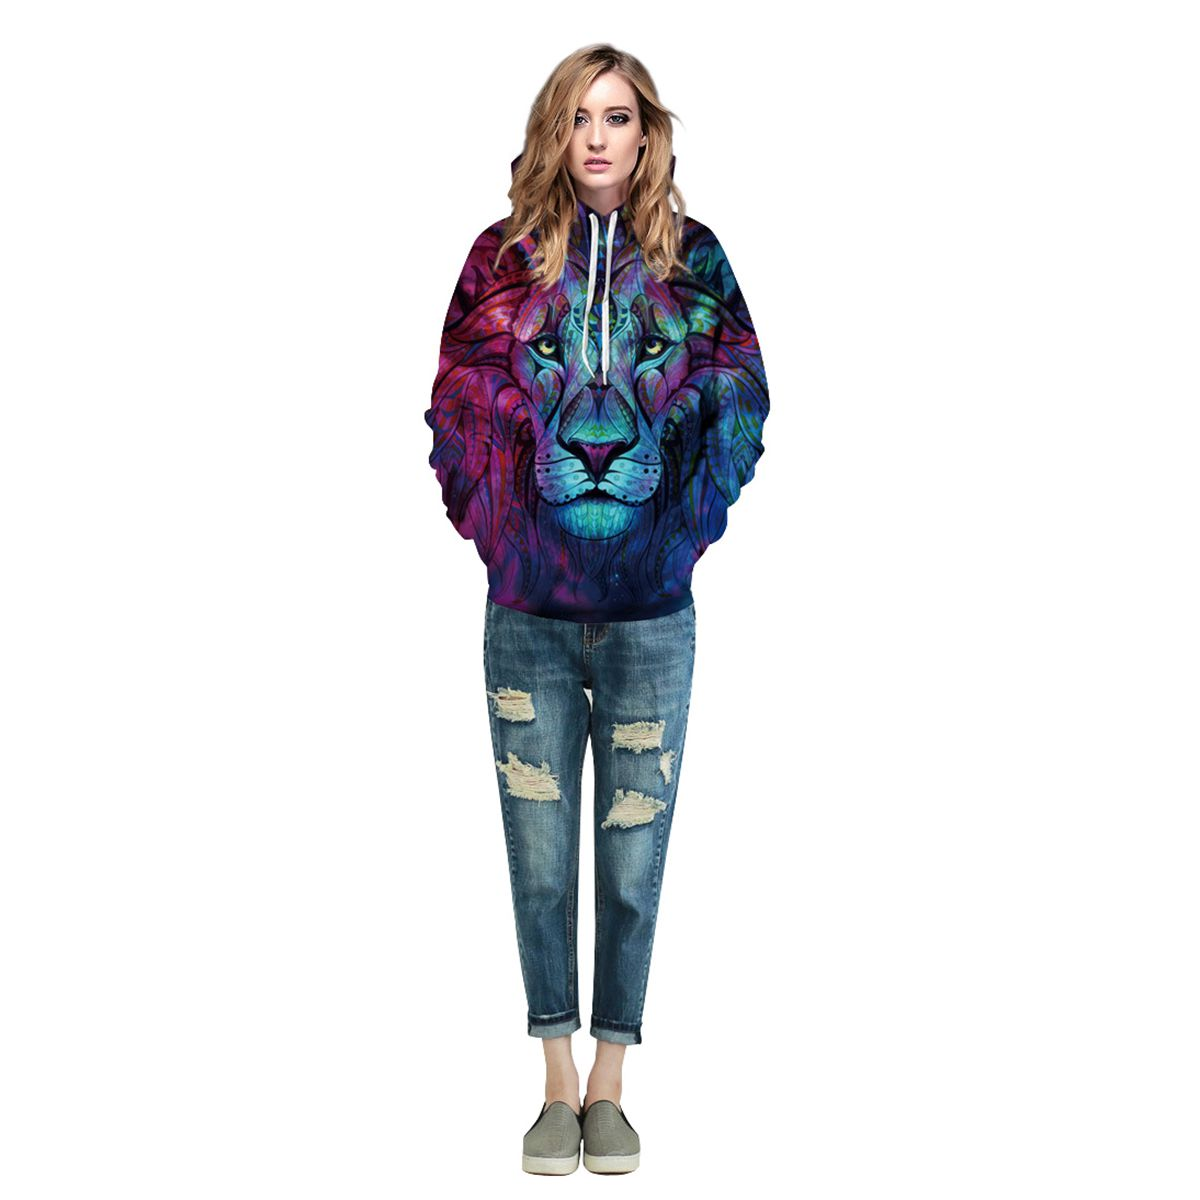 Men/Women New Fashion 3d Print Paisley Flowers Lion Hoodies Sweatshirts Spring Autumn Thin Hooded Pullovers Tops